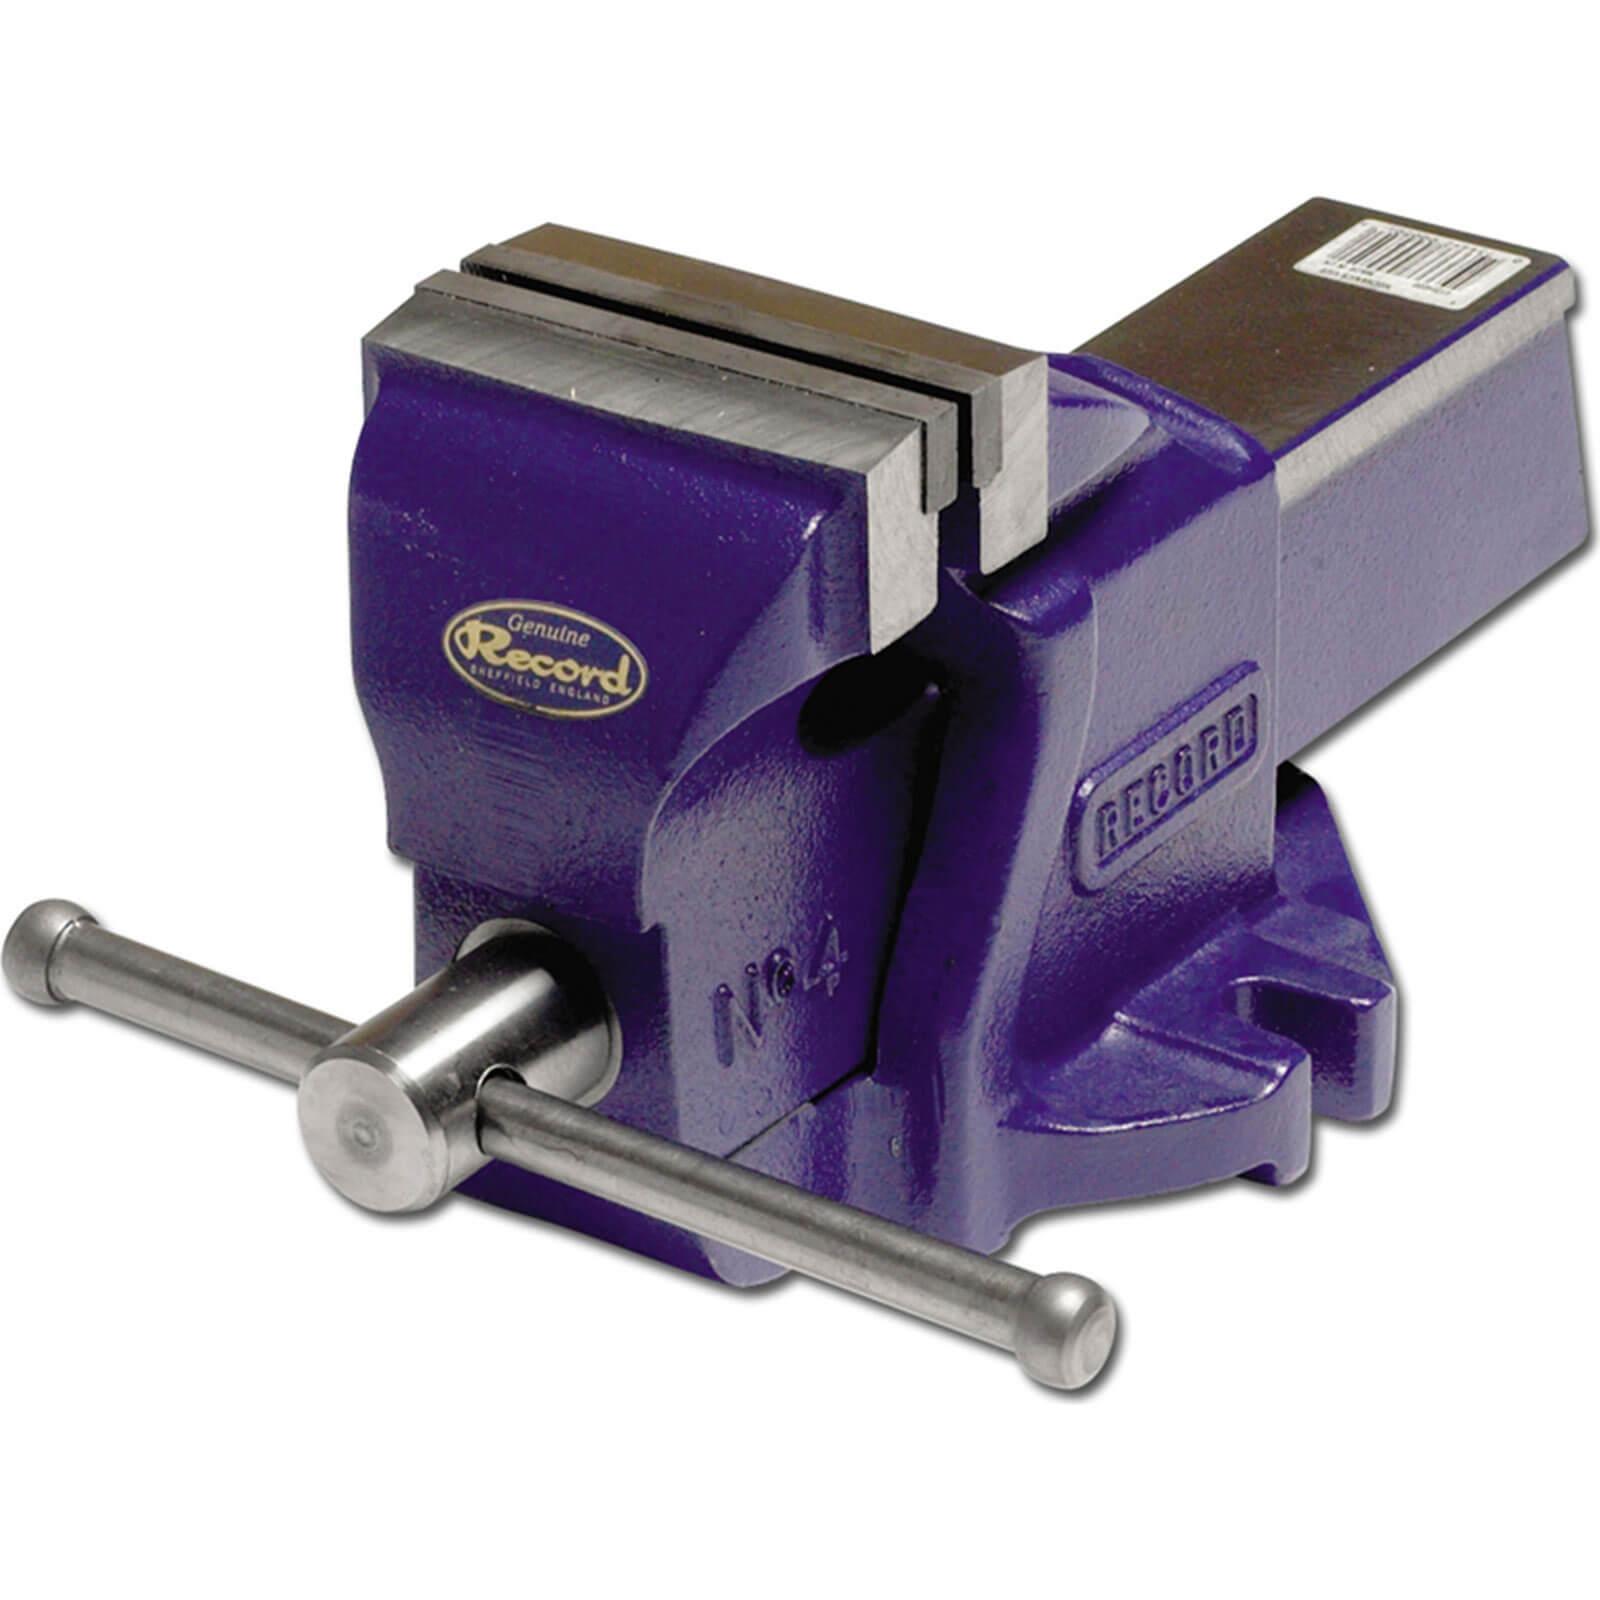 Image of Irwin Record Mechanics Vice 150mm